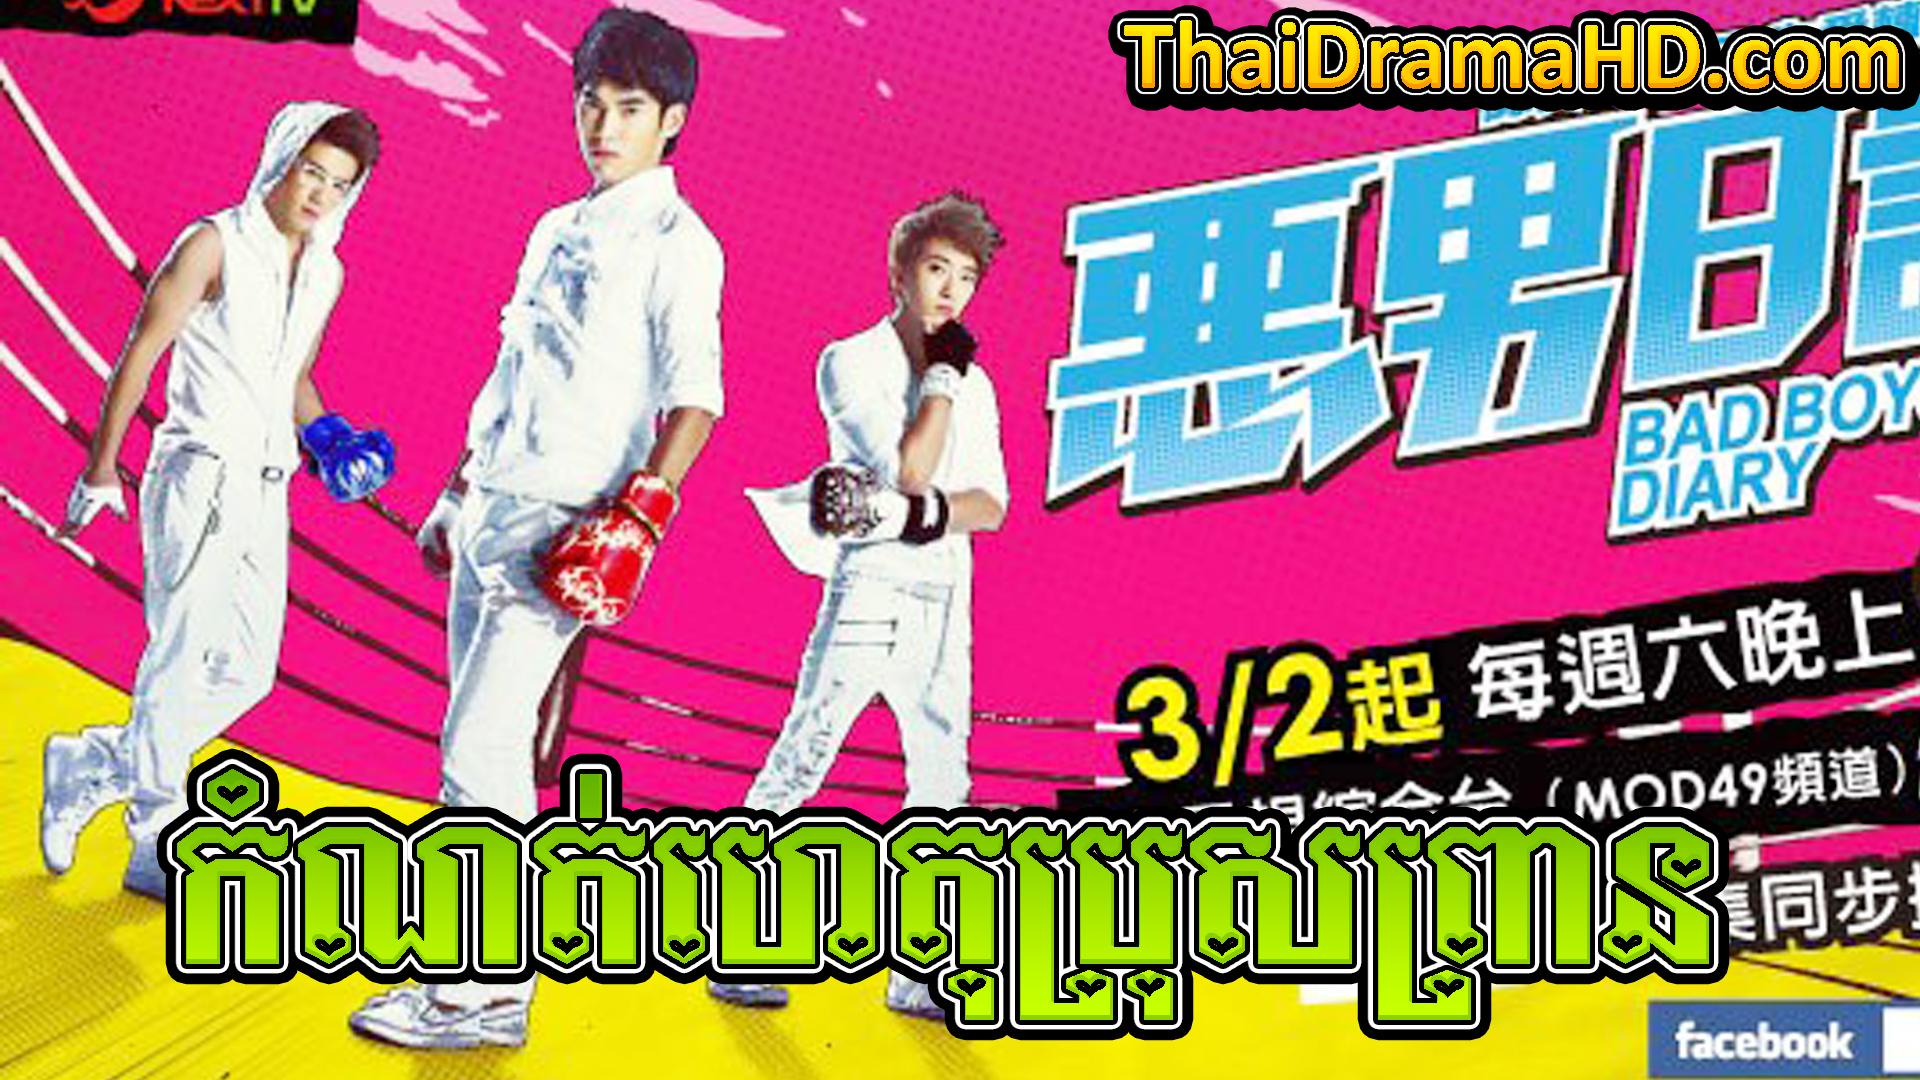 Kamnoth Het Pros Prean | Thai Drama | Khmer Movie | Phumikhmer | movie-khmer | video4khmer | khmotions | kolabkhmer | khmer drama | ksdrama | cookingtips | roscheat | khmertimeskh | khmerkomsan | phumi7 | merlkon | film2us | movie2kh | sweetdrama | khmercitylove | khreplay | tvb cambodia drama | ckh7 | srokthai | phumimedia | phumi8 | khmer avenue | khmer search | Soyo | khmerfans